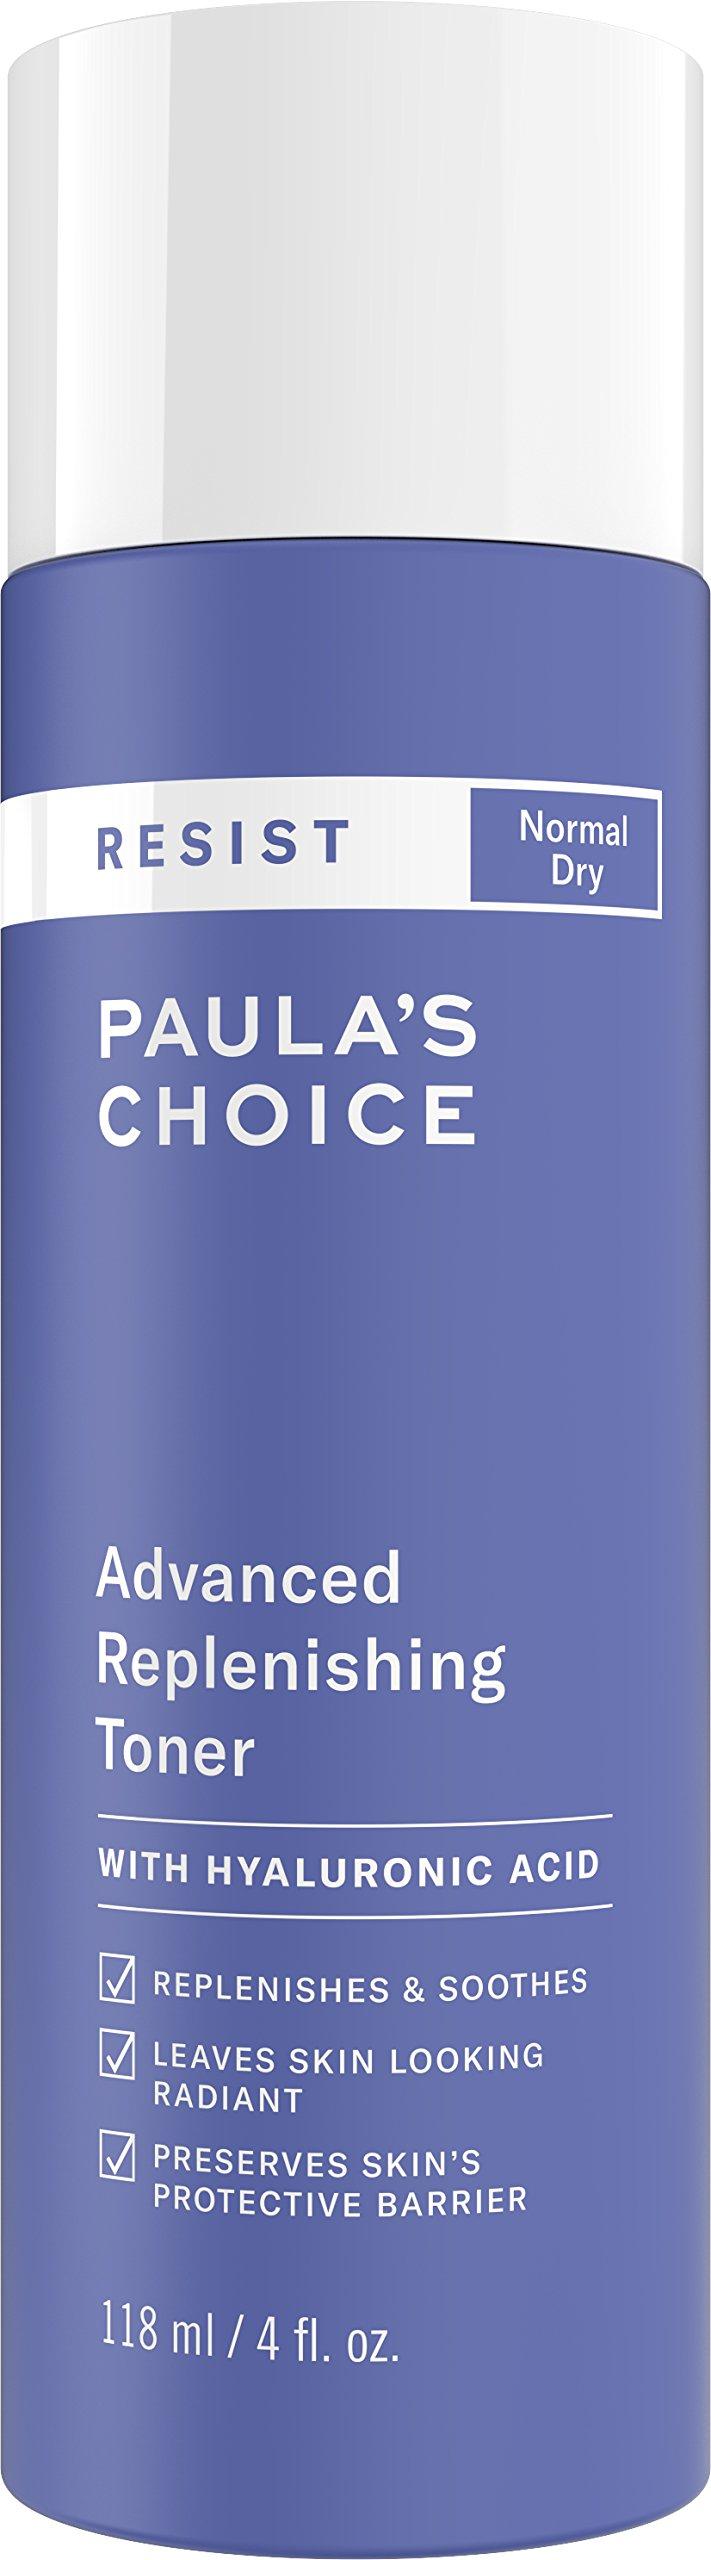 Paula's Choice-RESIST Advanced Replenishing Anti-Aging Toner, 4 Ounce Bottle, with Vitamins C & E by PAULA'S CHOICE